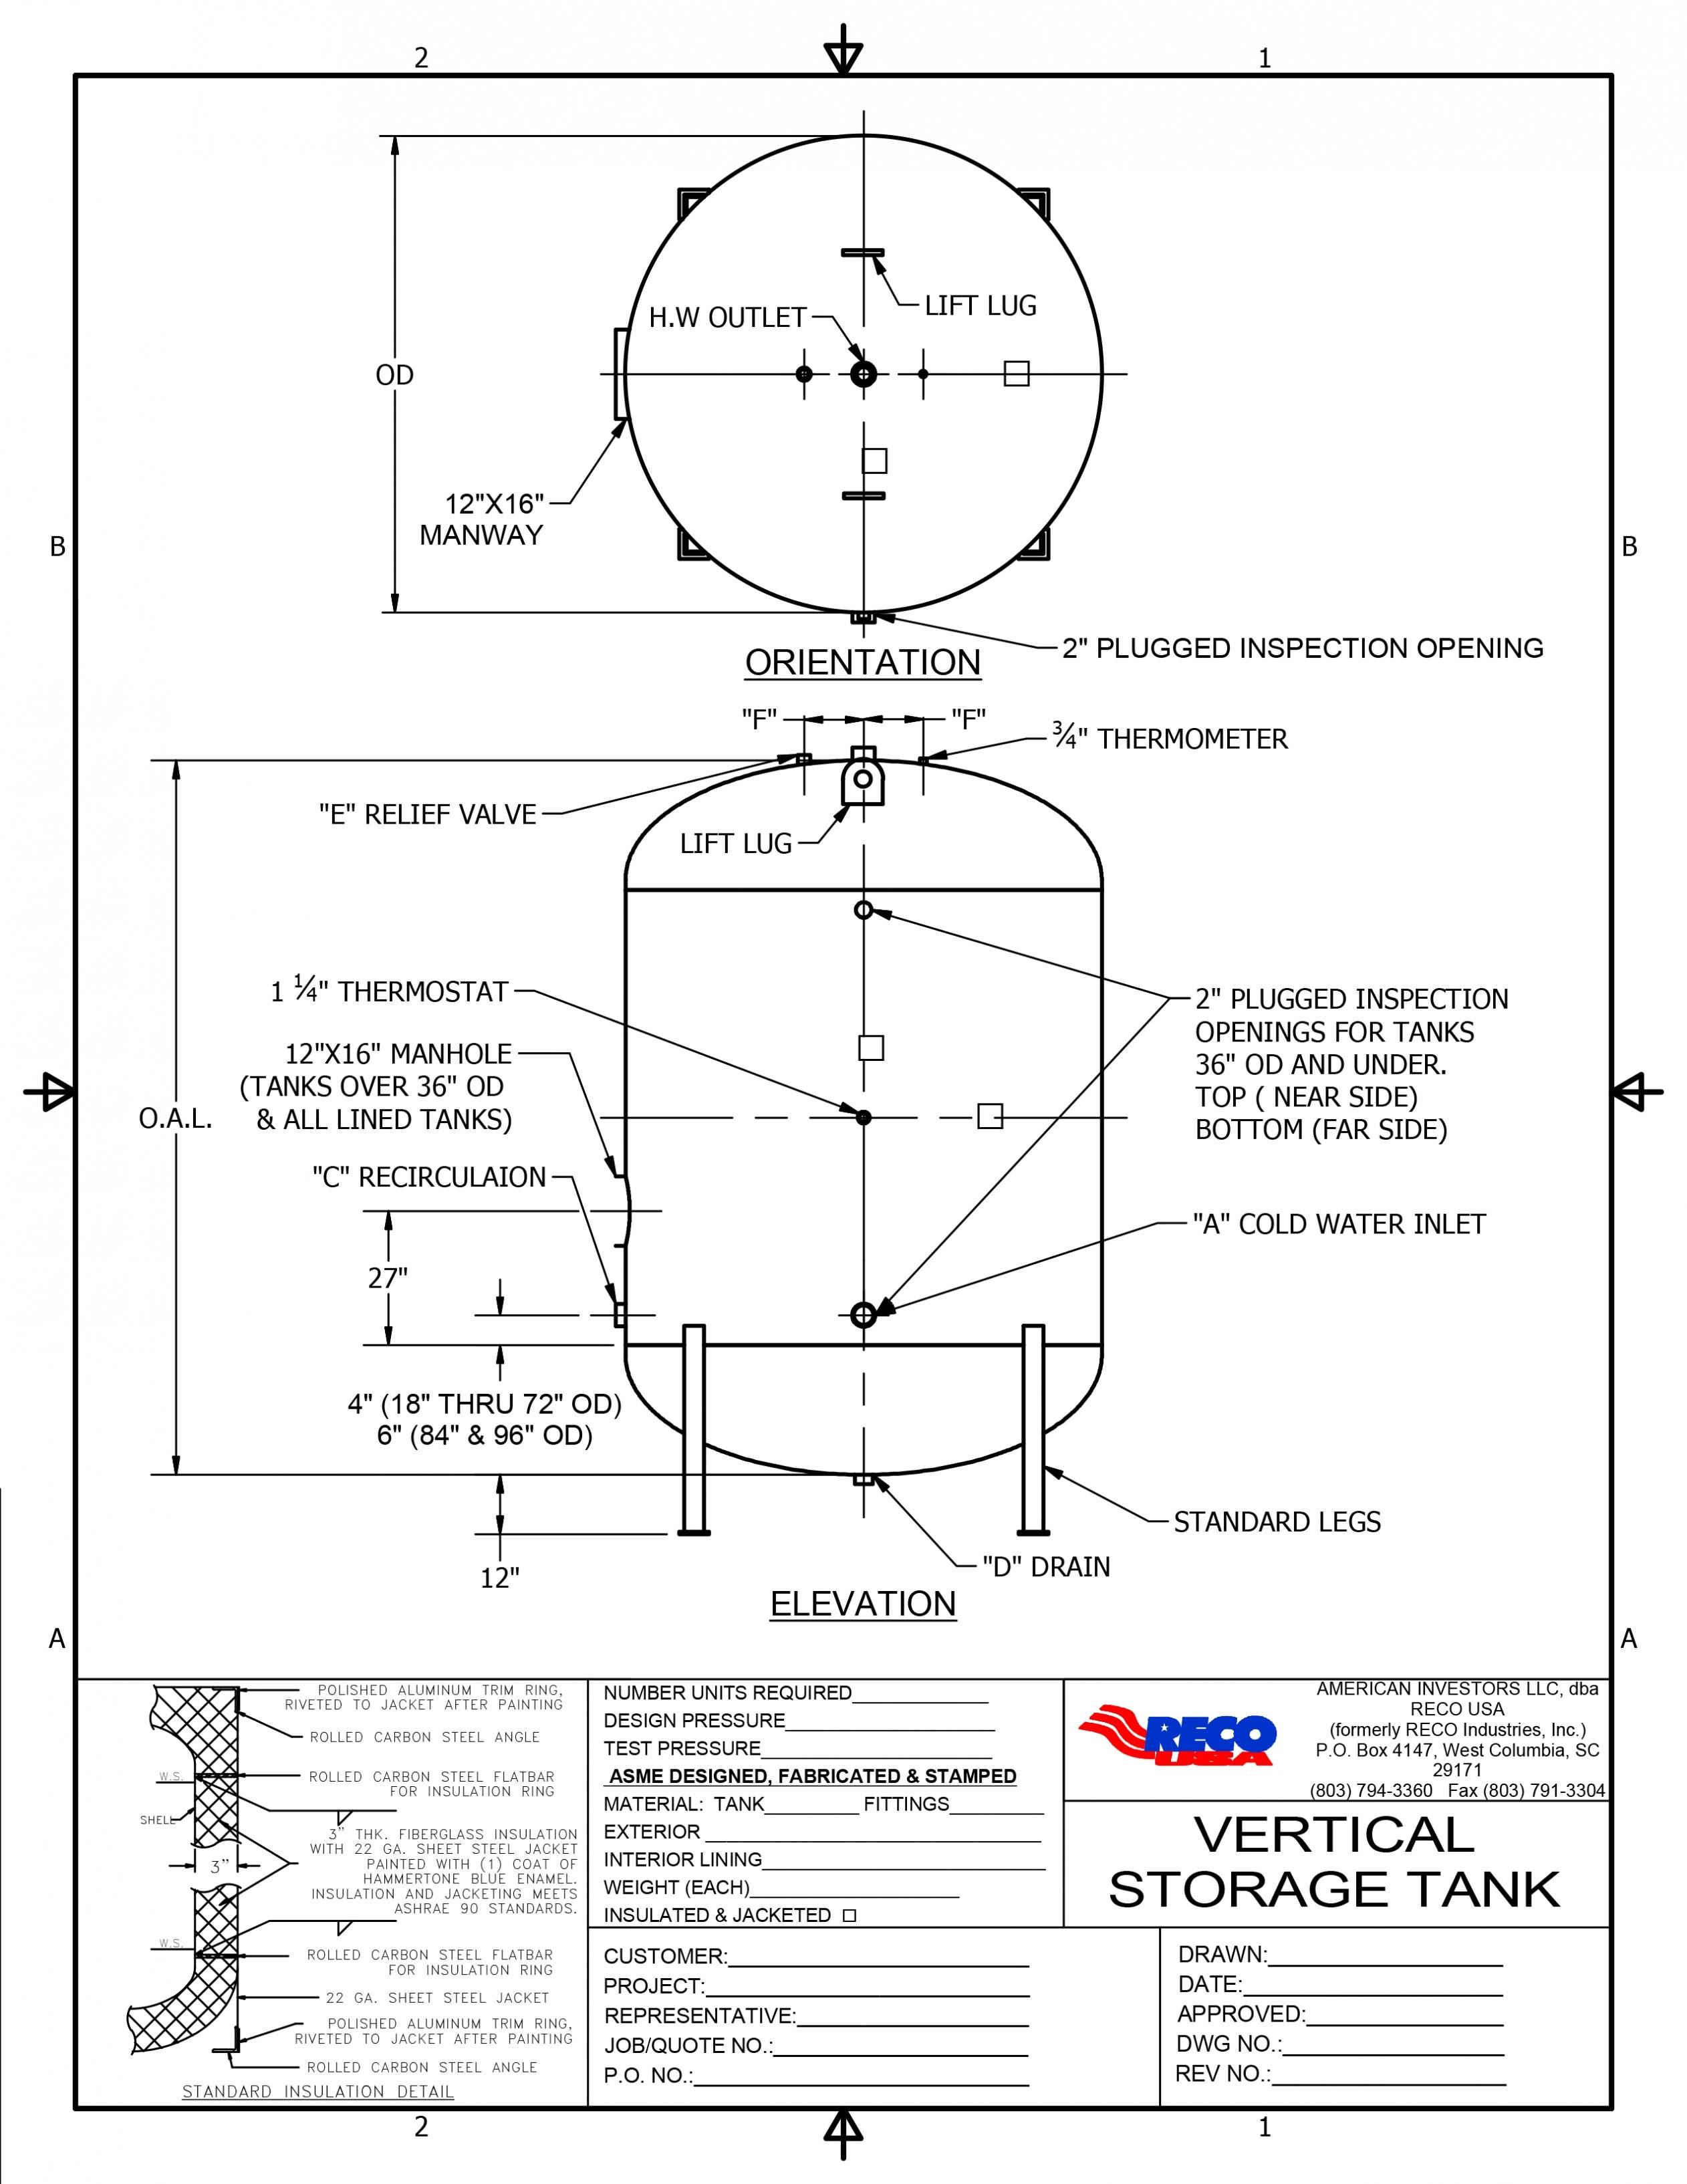 Car Fuel System Diagram International Fuel Diagram Wiring Diagram Services • Of Car Fuel System Diagram